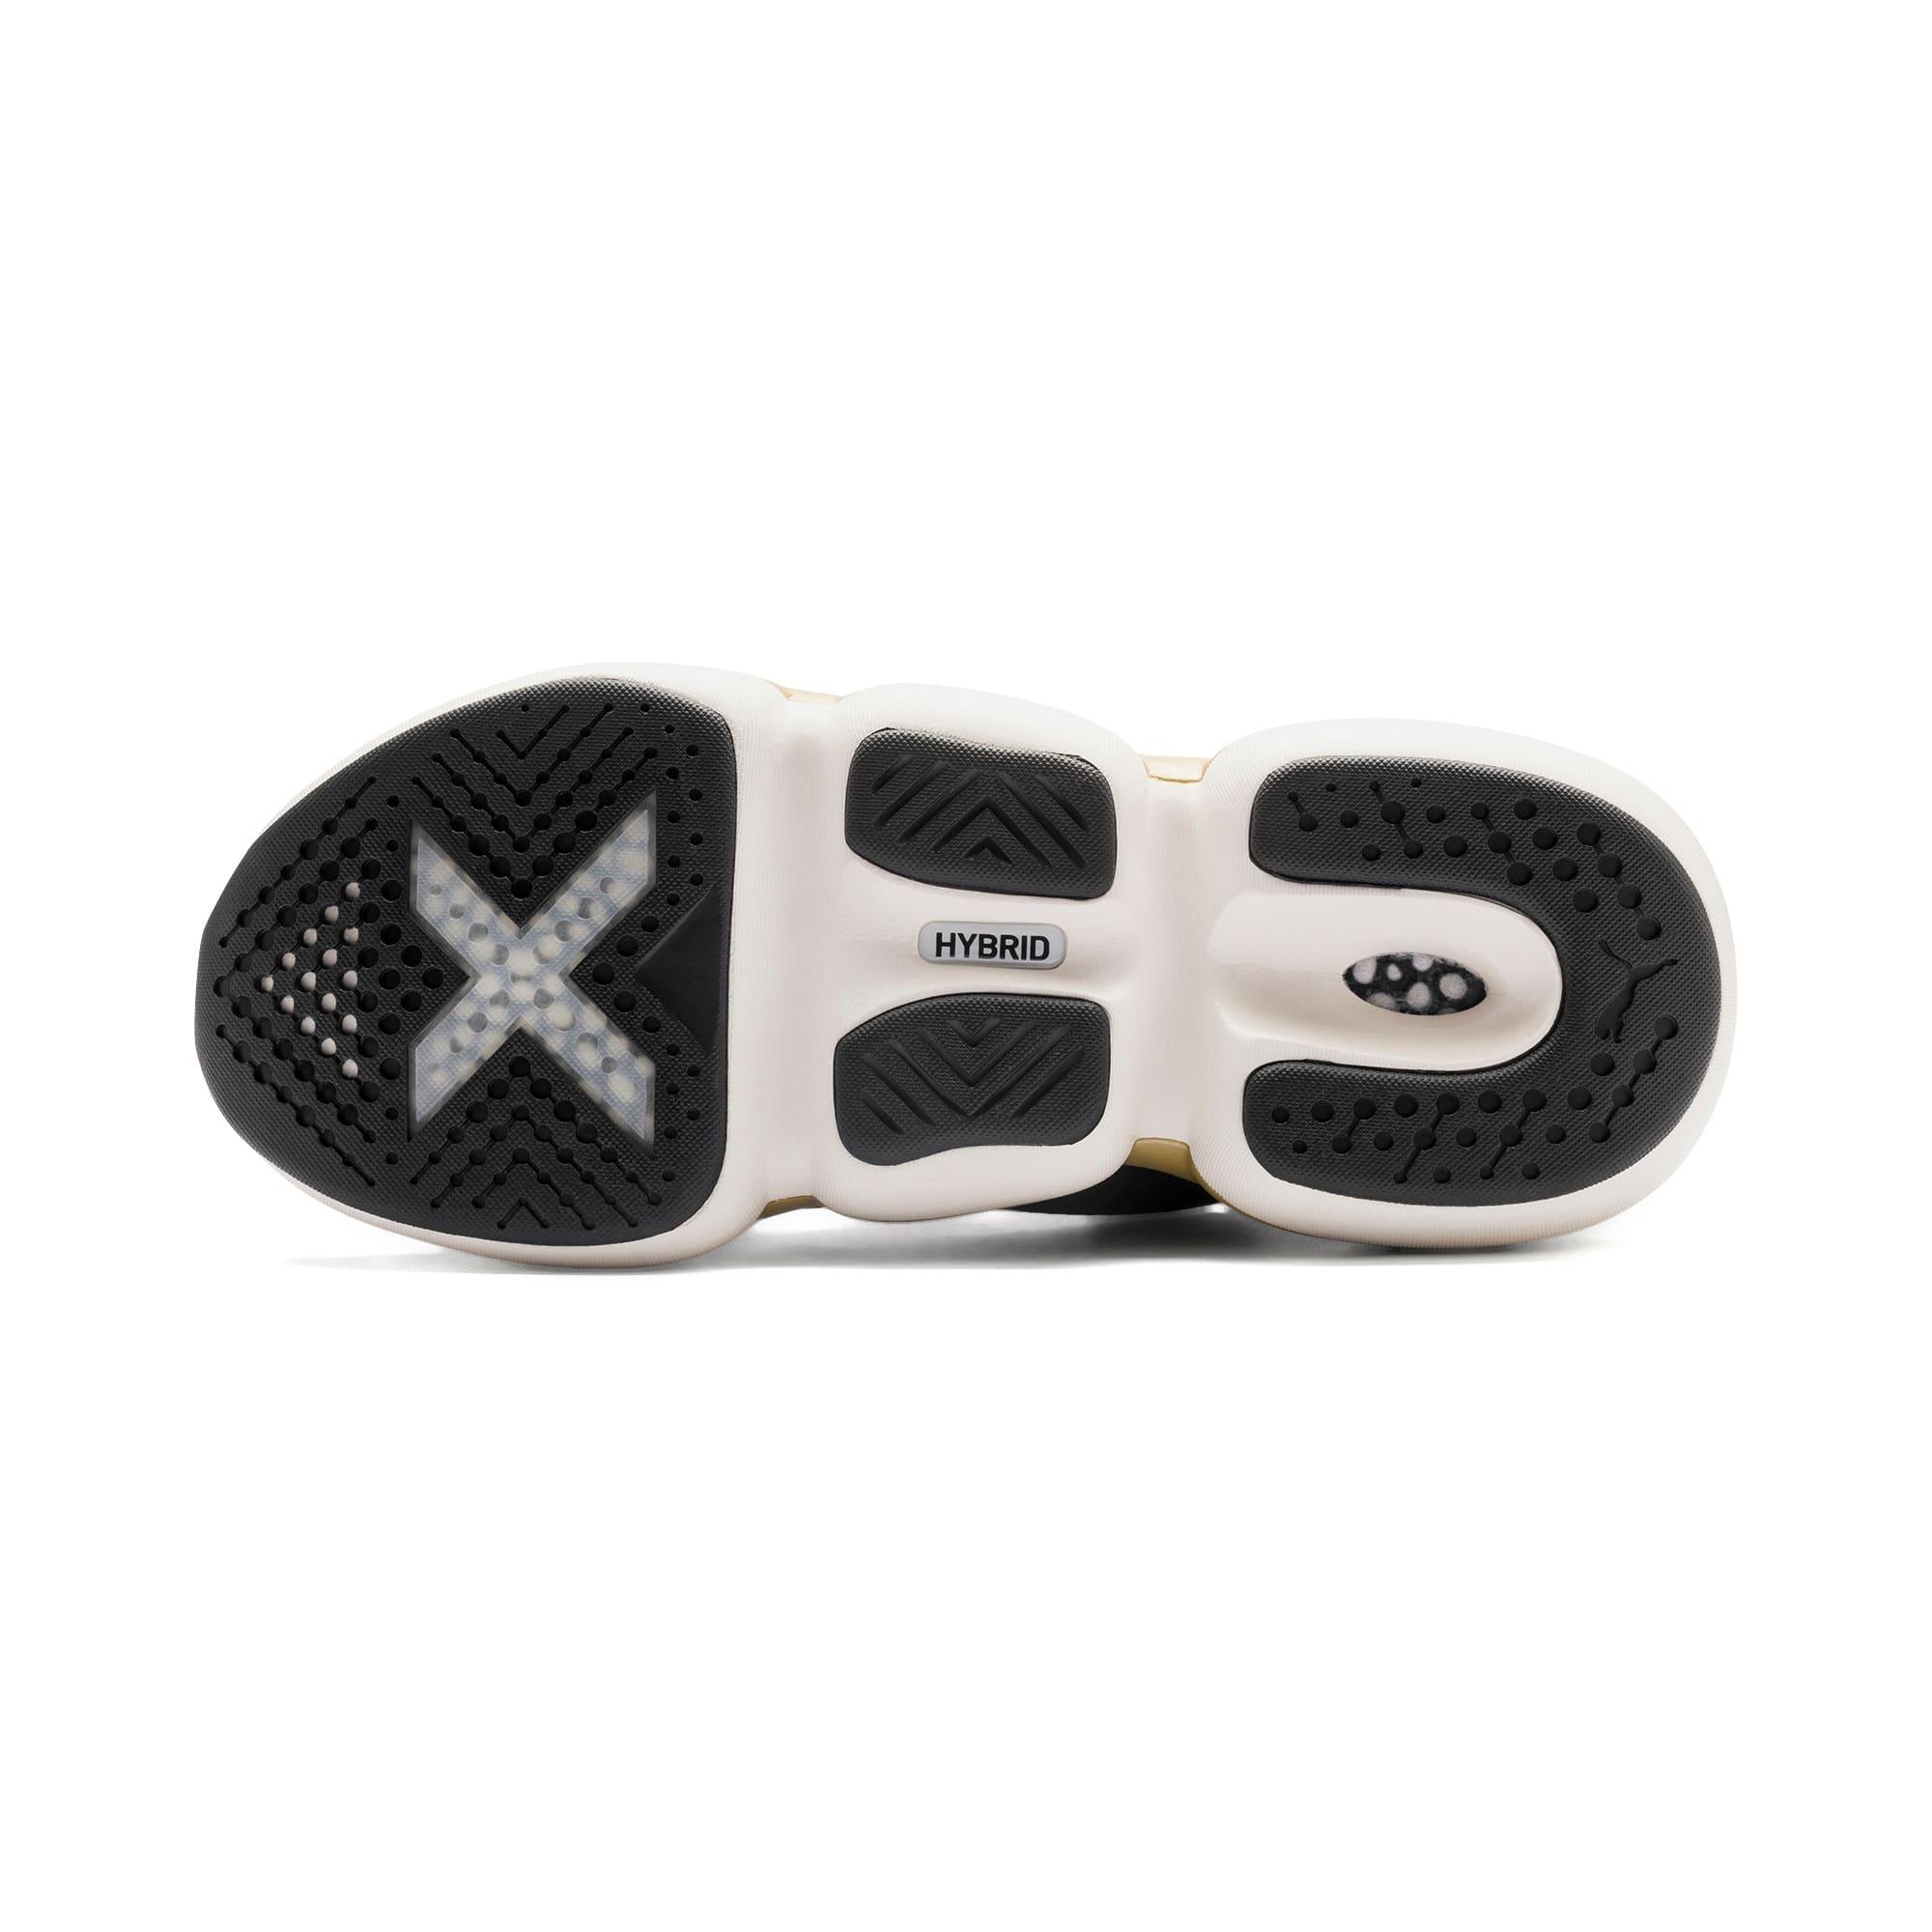 Thumbnail 4 of Mode XT Sweet Women's Training Shoes, Black- White-Purple, medium